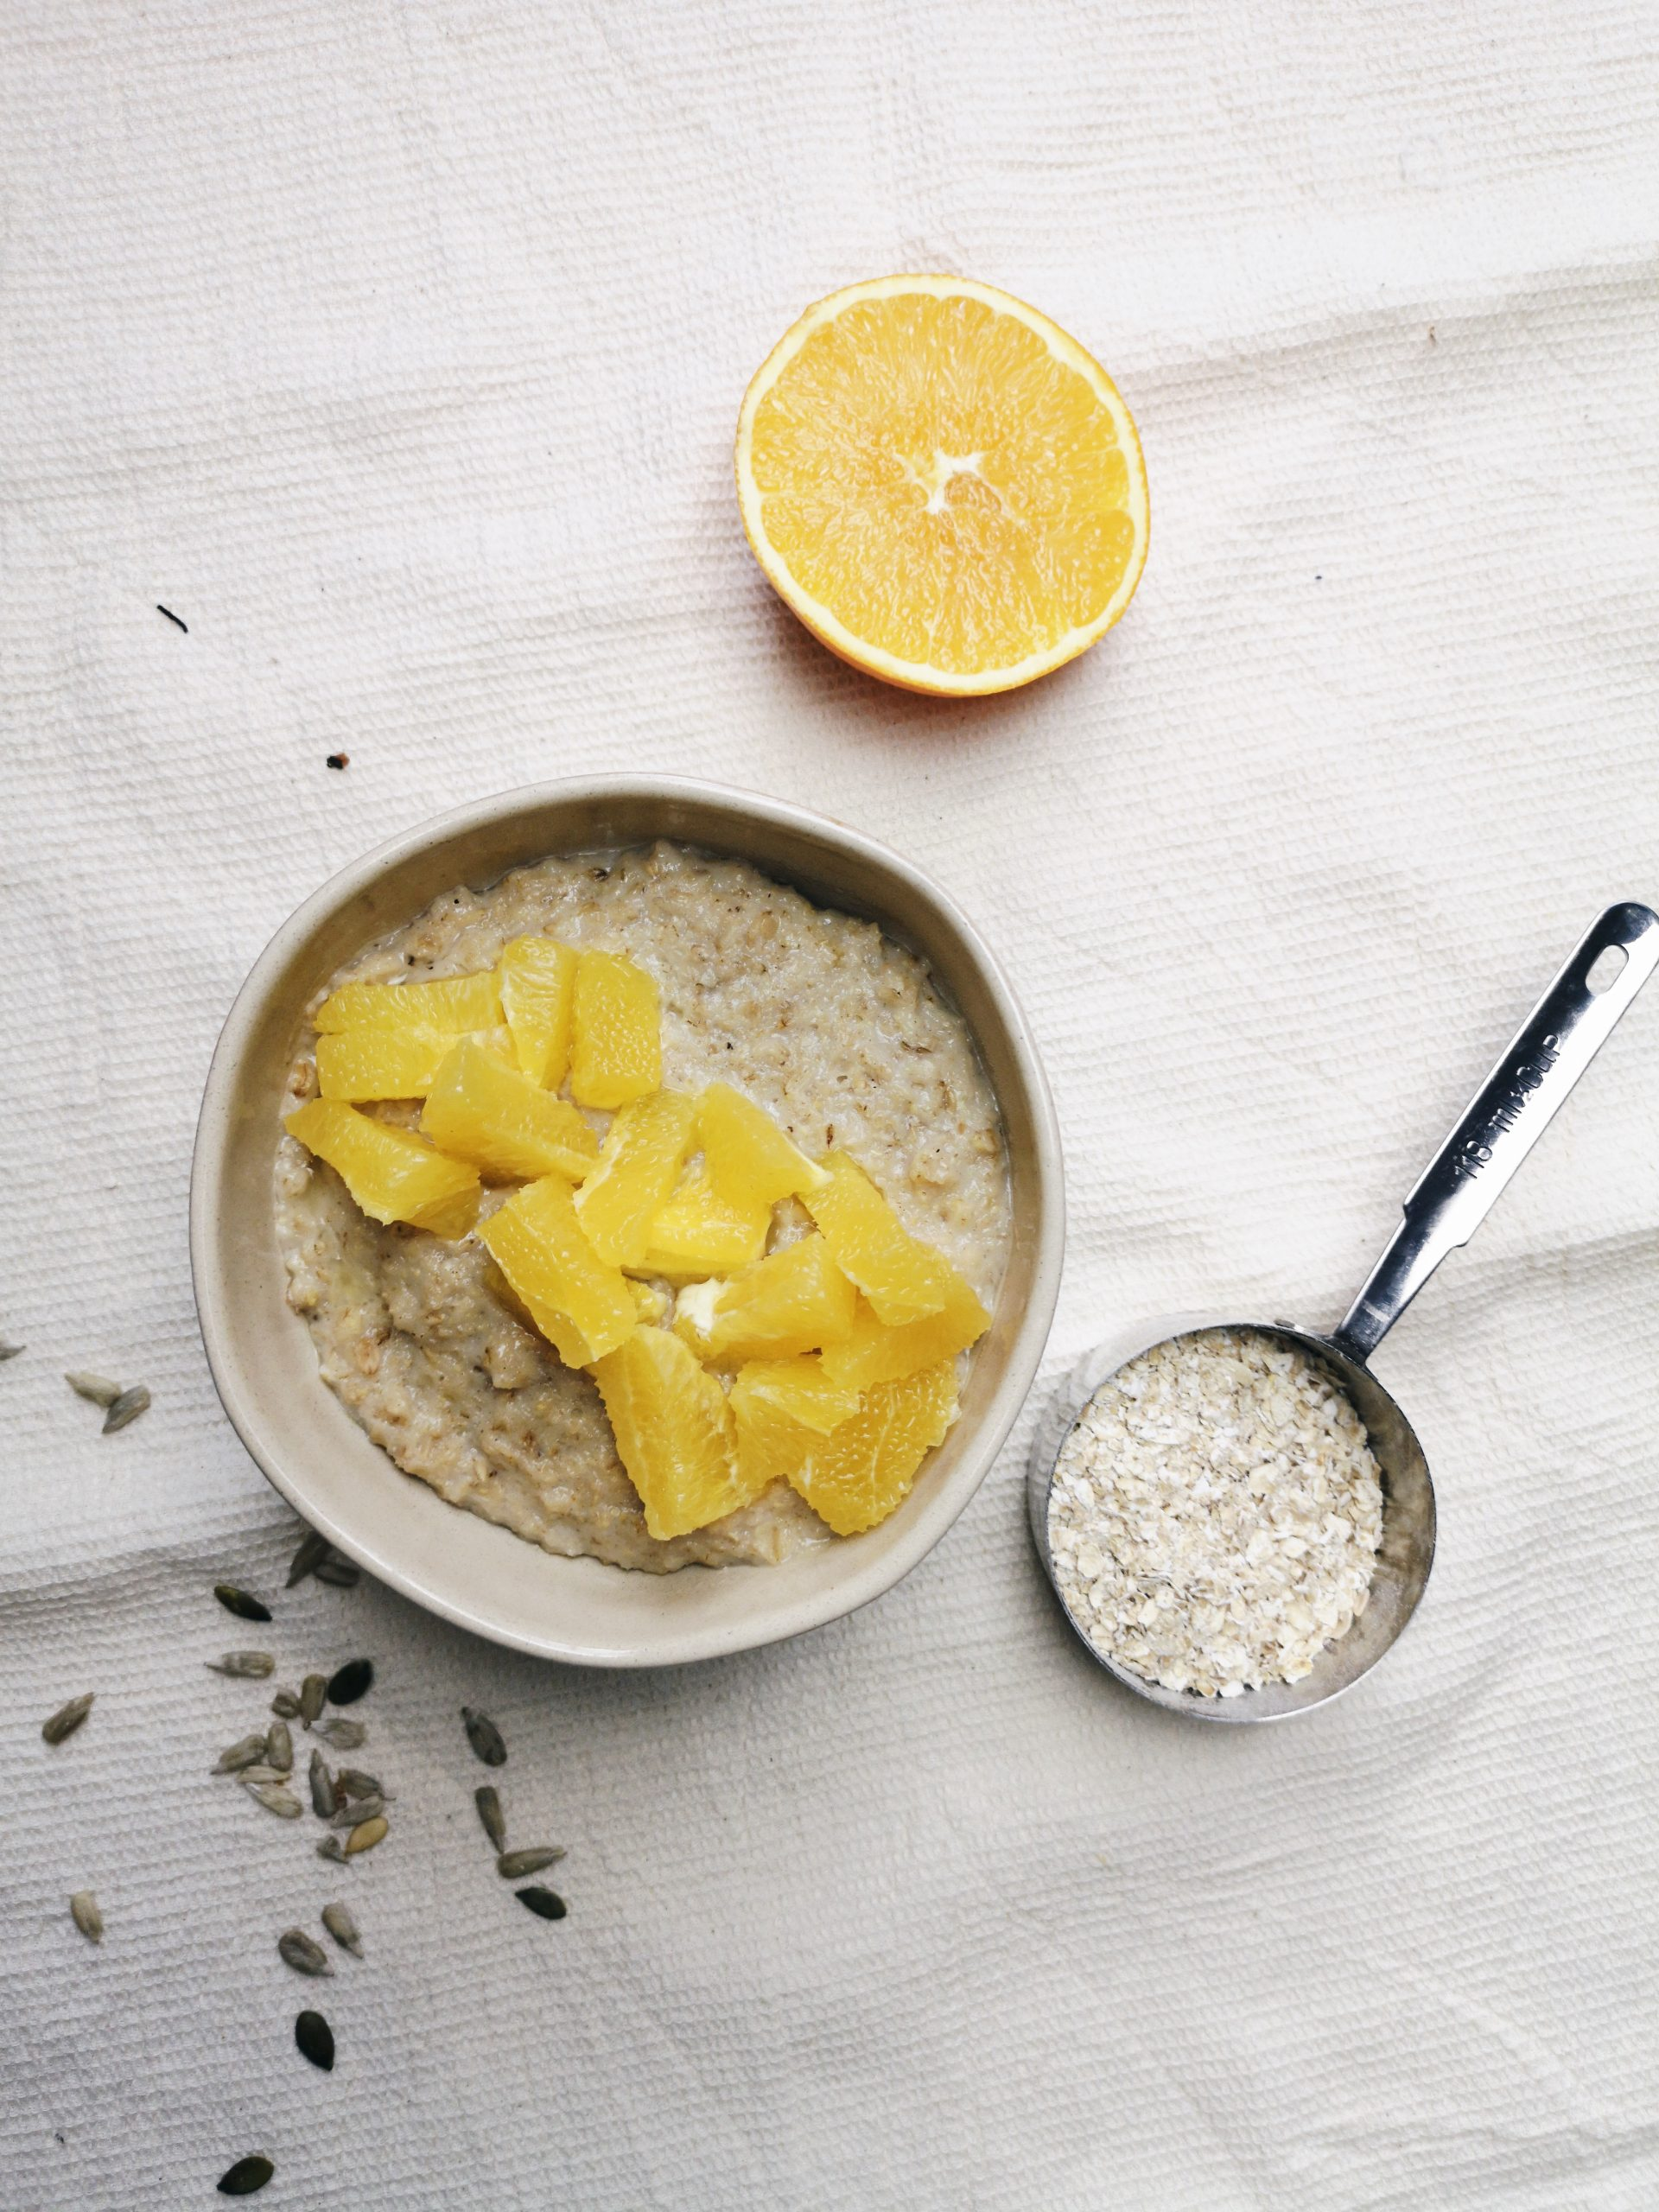 havermout-recept-ontbijt